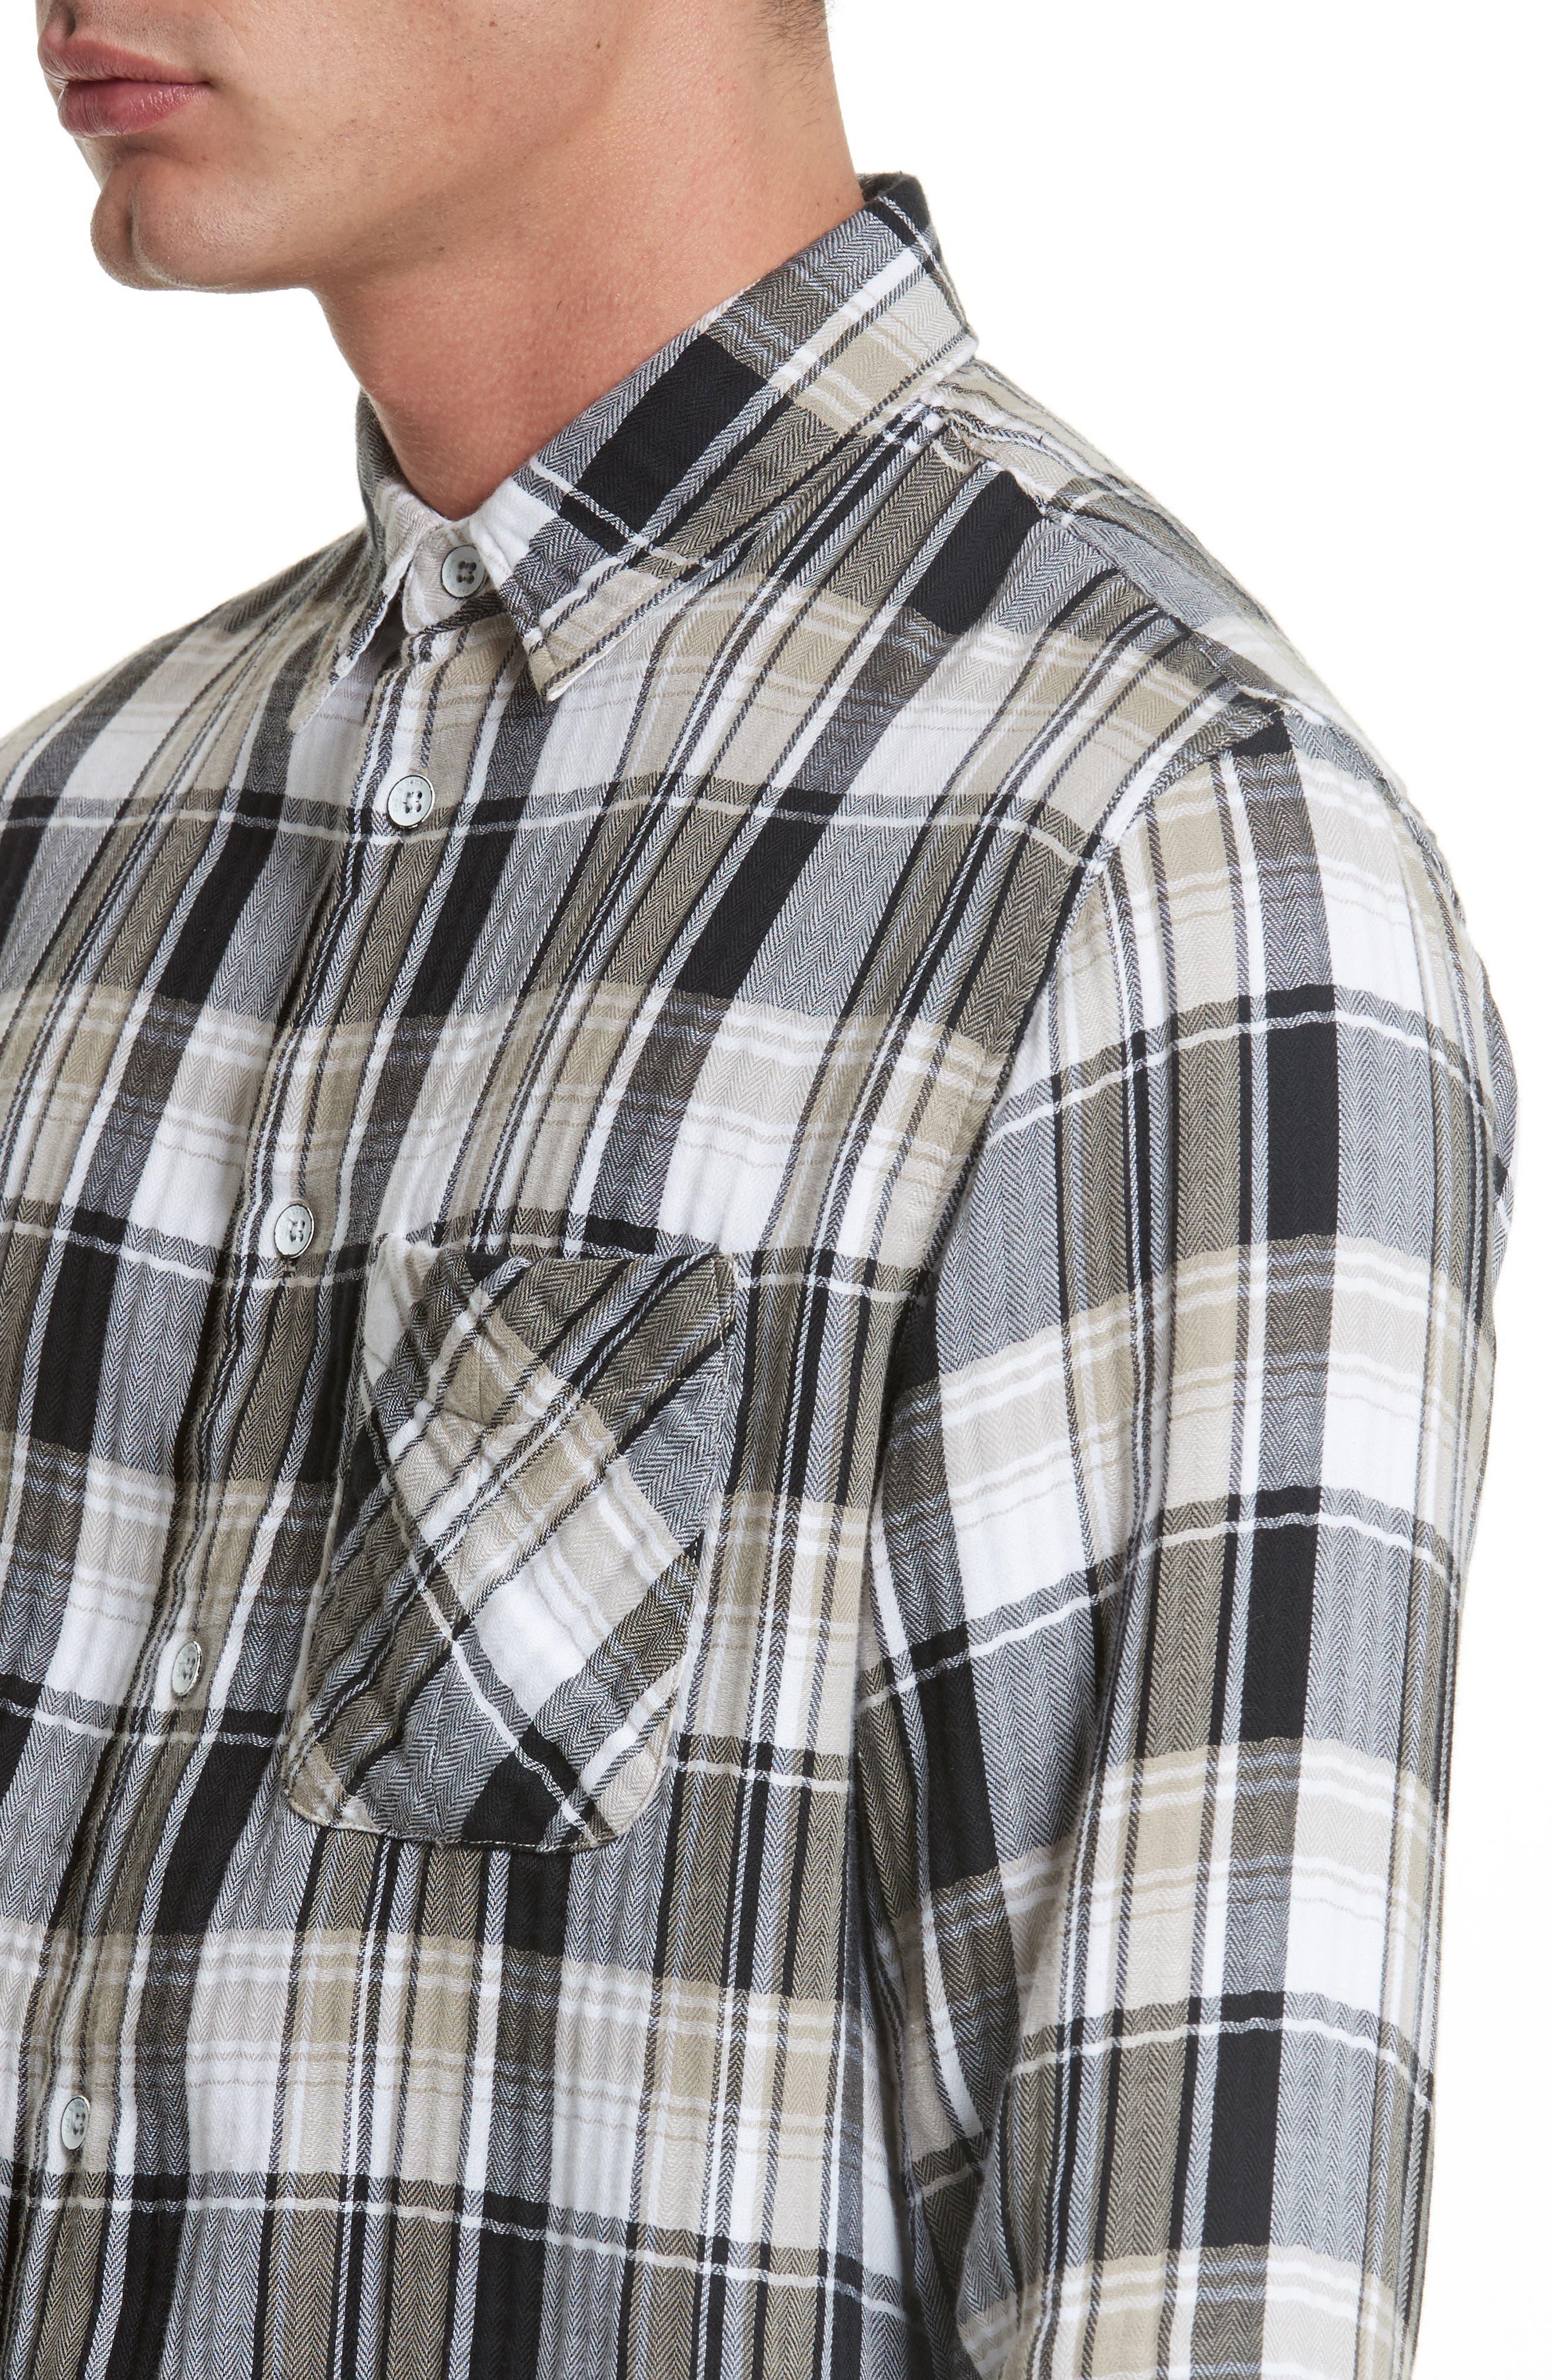 Fit 3 Beach Plaid Woven Shirt,                             Alternate thumbnail 4, color,                             200